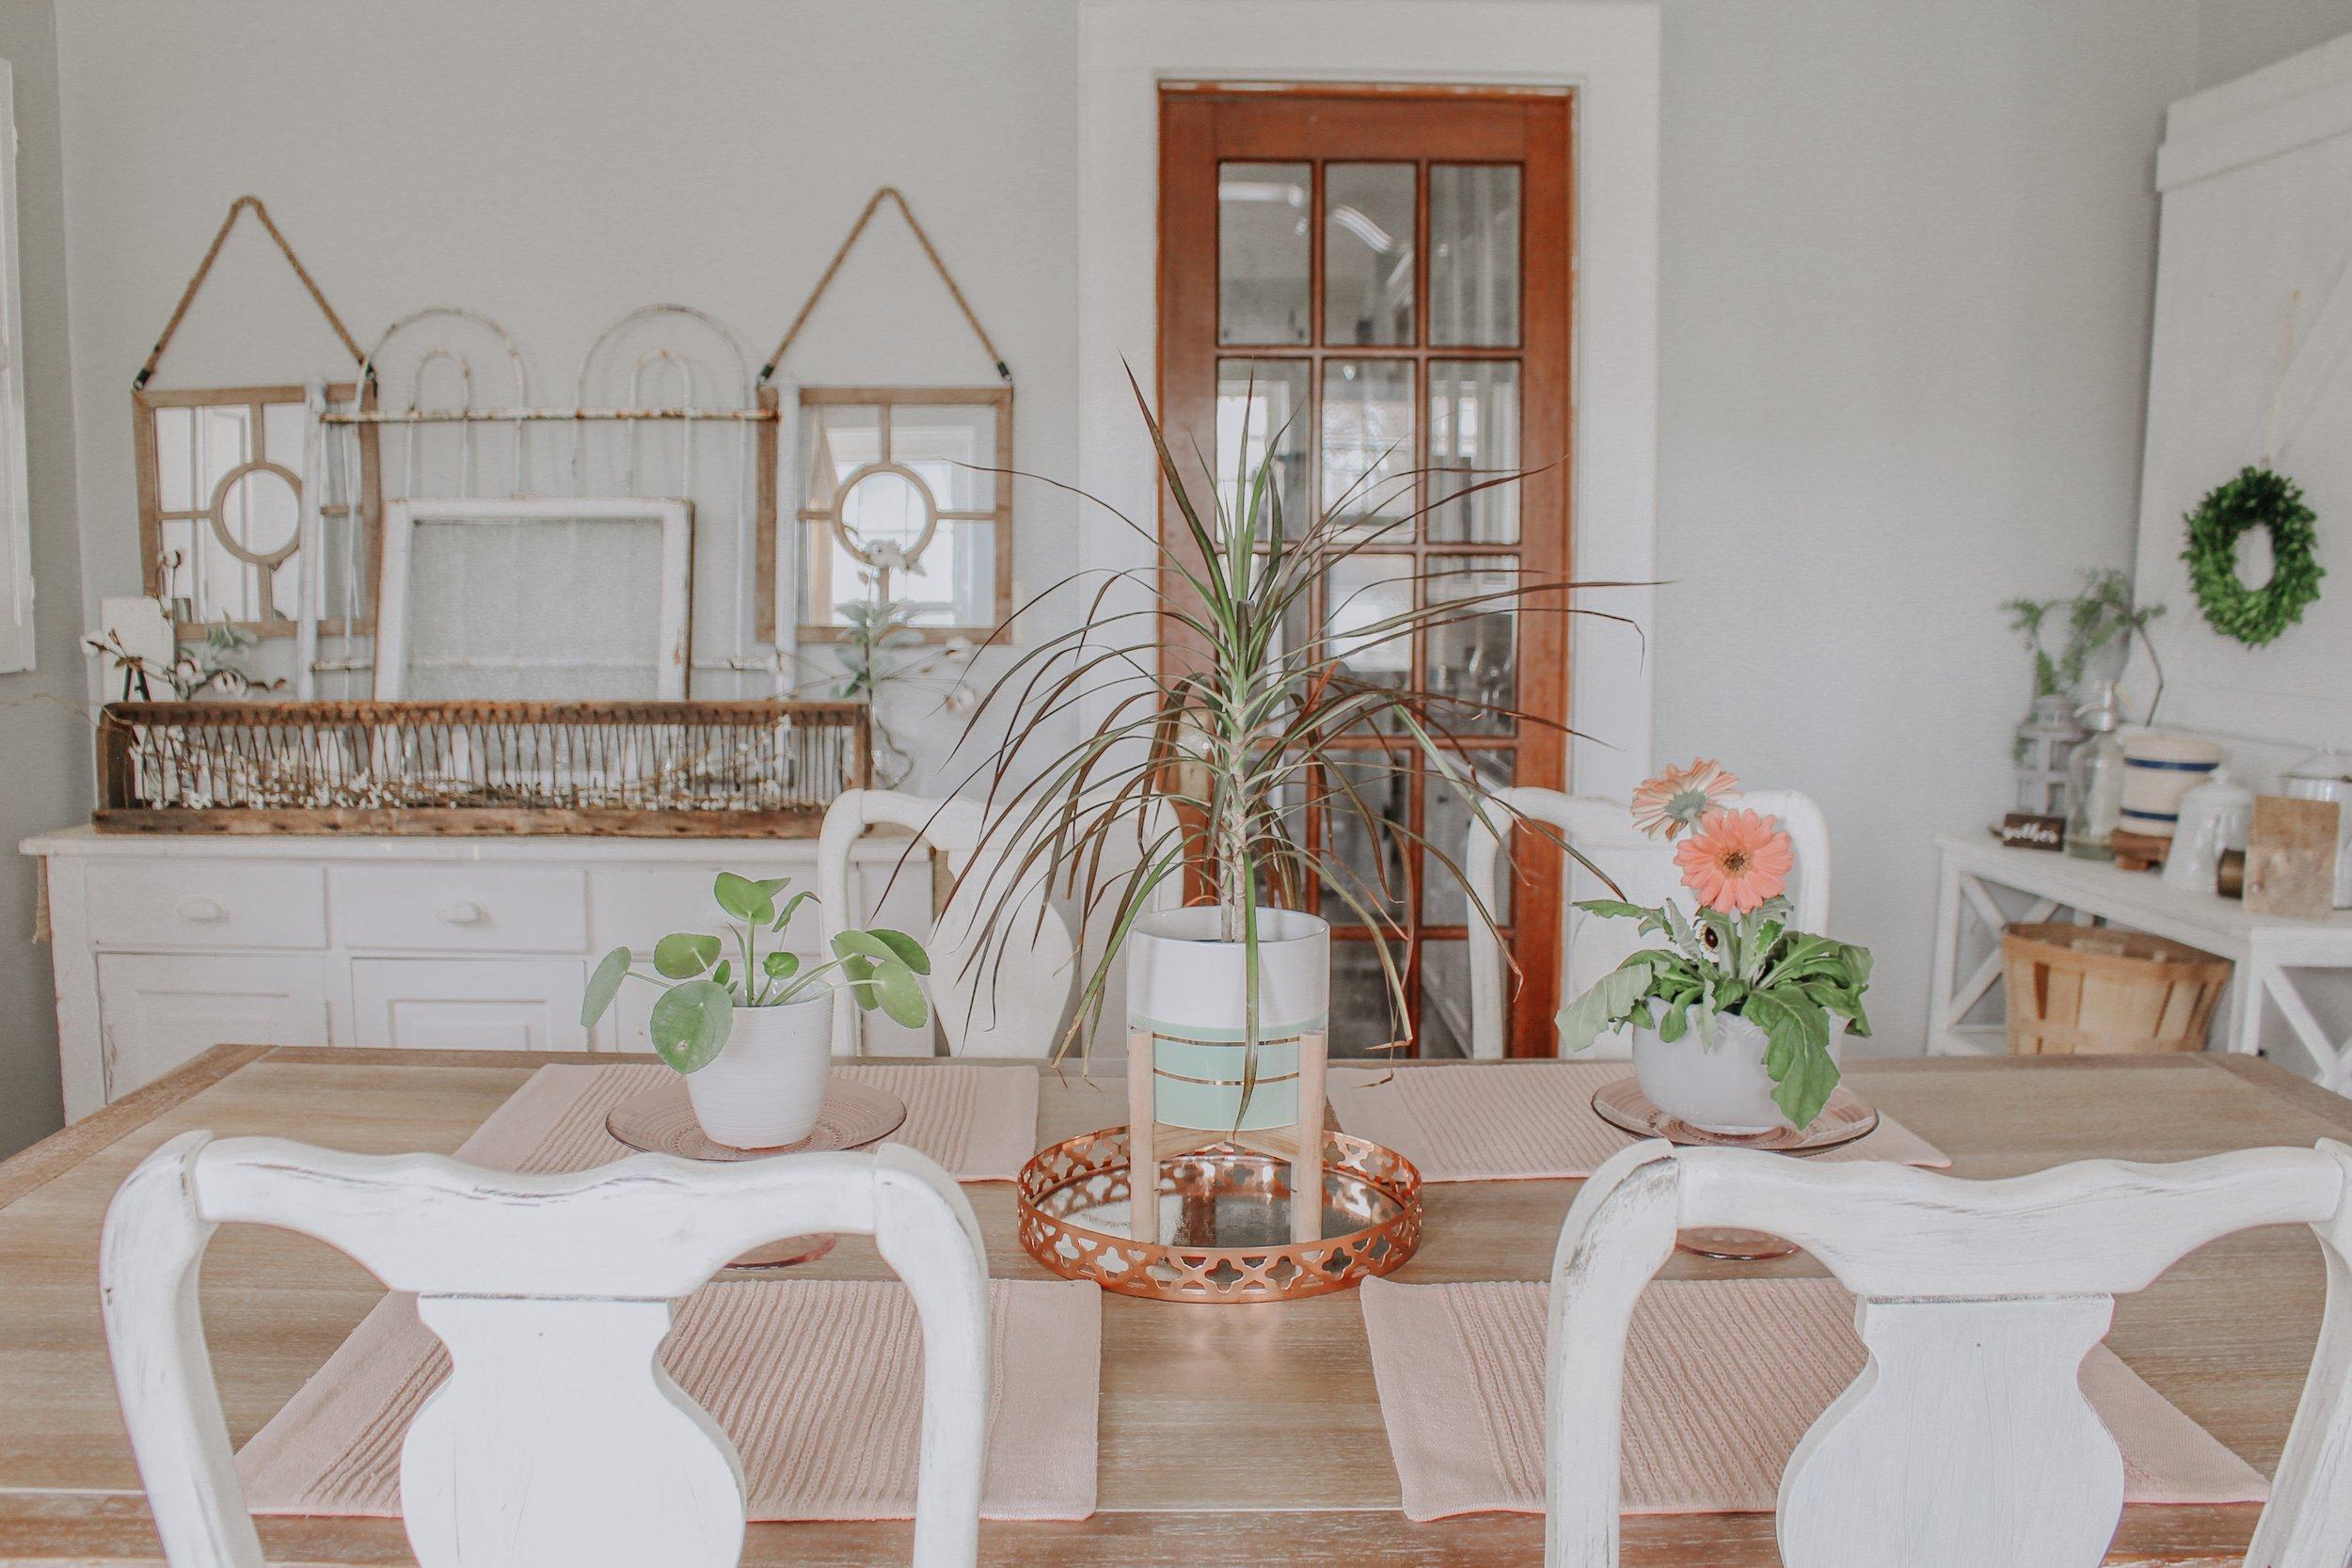 Pilea Plant, Dracaena, and Gerbera Daisy